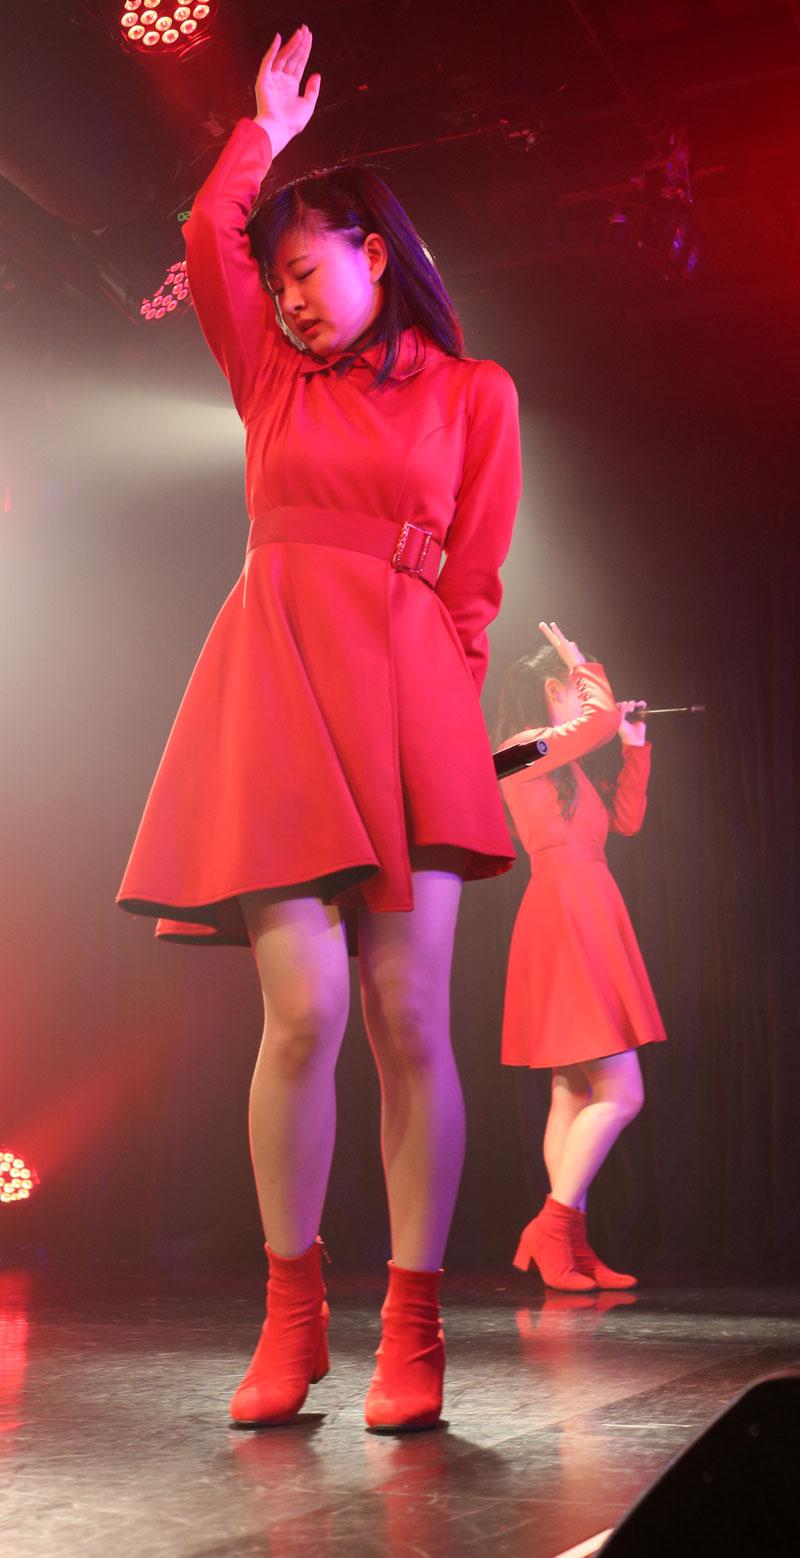 Images : 13番目の画像 - 「九州女子翼/TIF出場も決まって乗りに乗るグループが、初の東京定期公演をAKIBAカルチャーズ劇場で開催! 地元と変わらぬ熱いステージを構築!!」のアルバム - Stereo Sound ONLINE